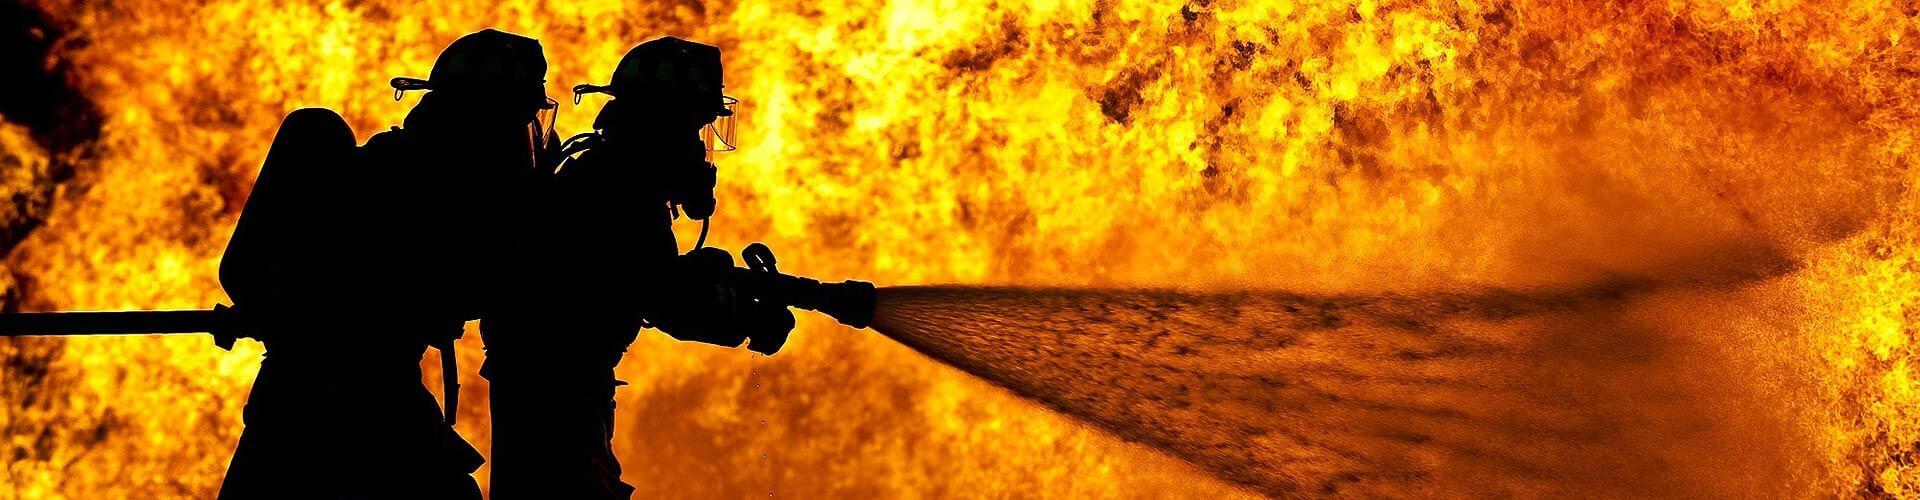 Indiana Volunteer Firefighters Association